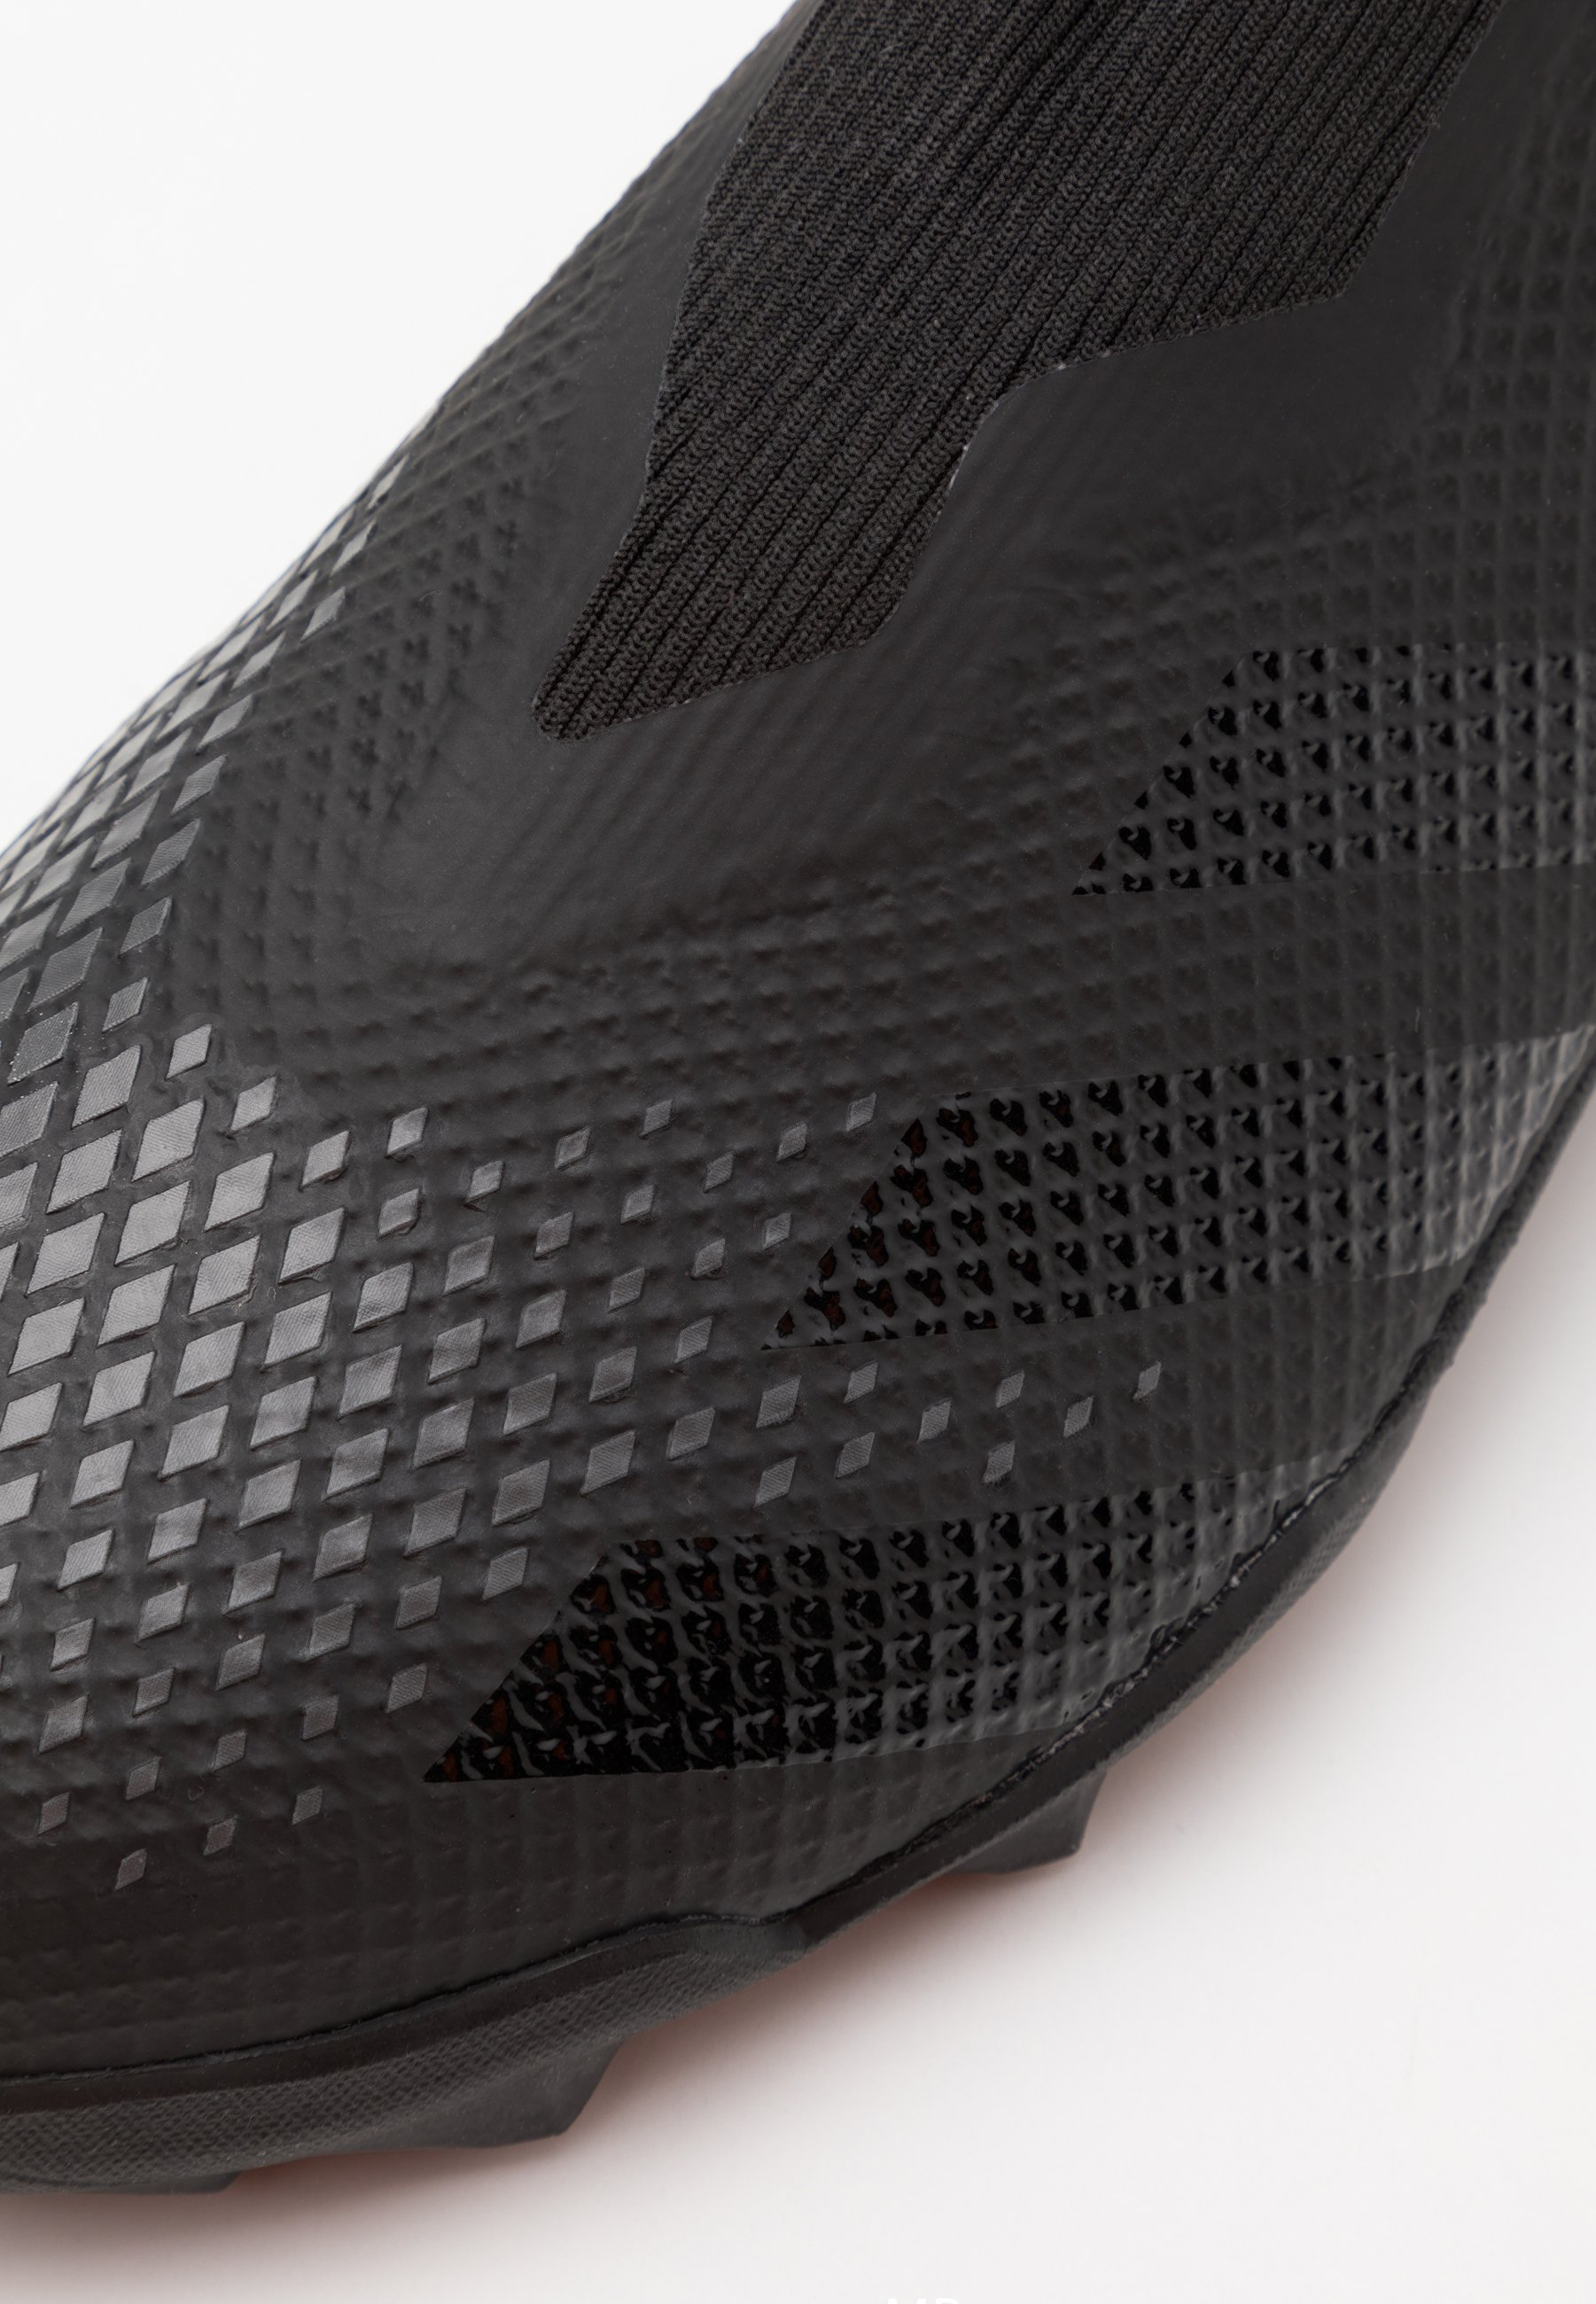 PREDATOR 20.3 FOOTBALL TURF Fotbollsskor universaldobbar core blackclear blackdough solid grey